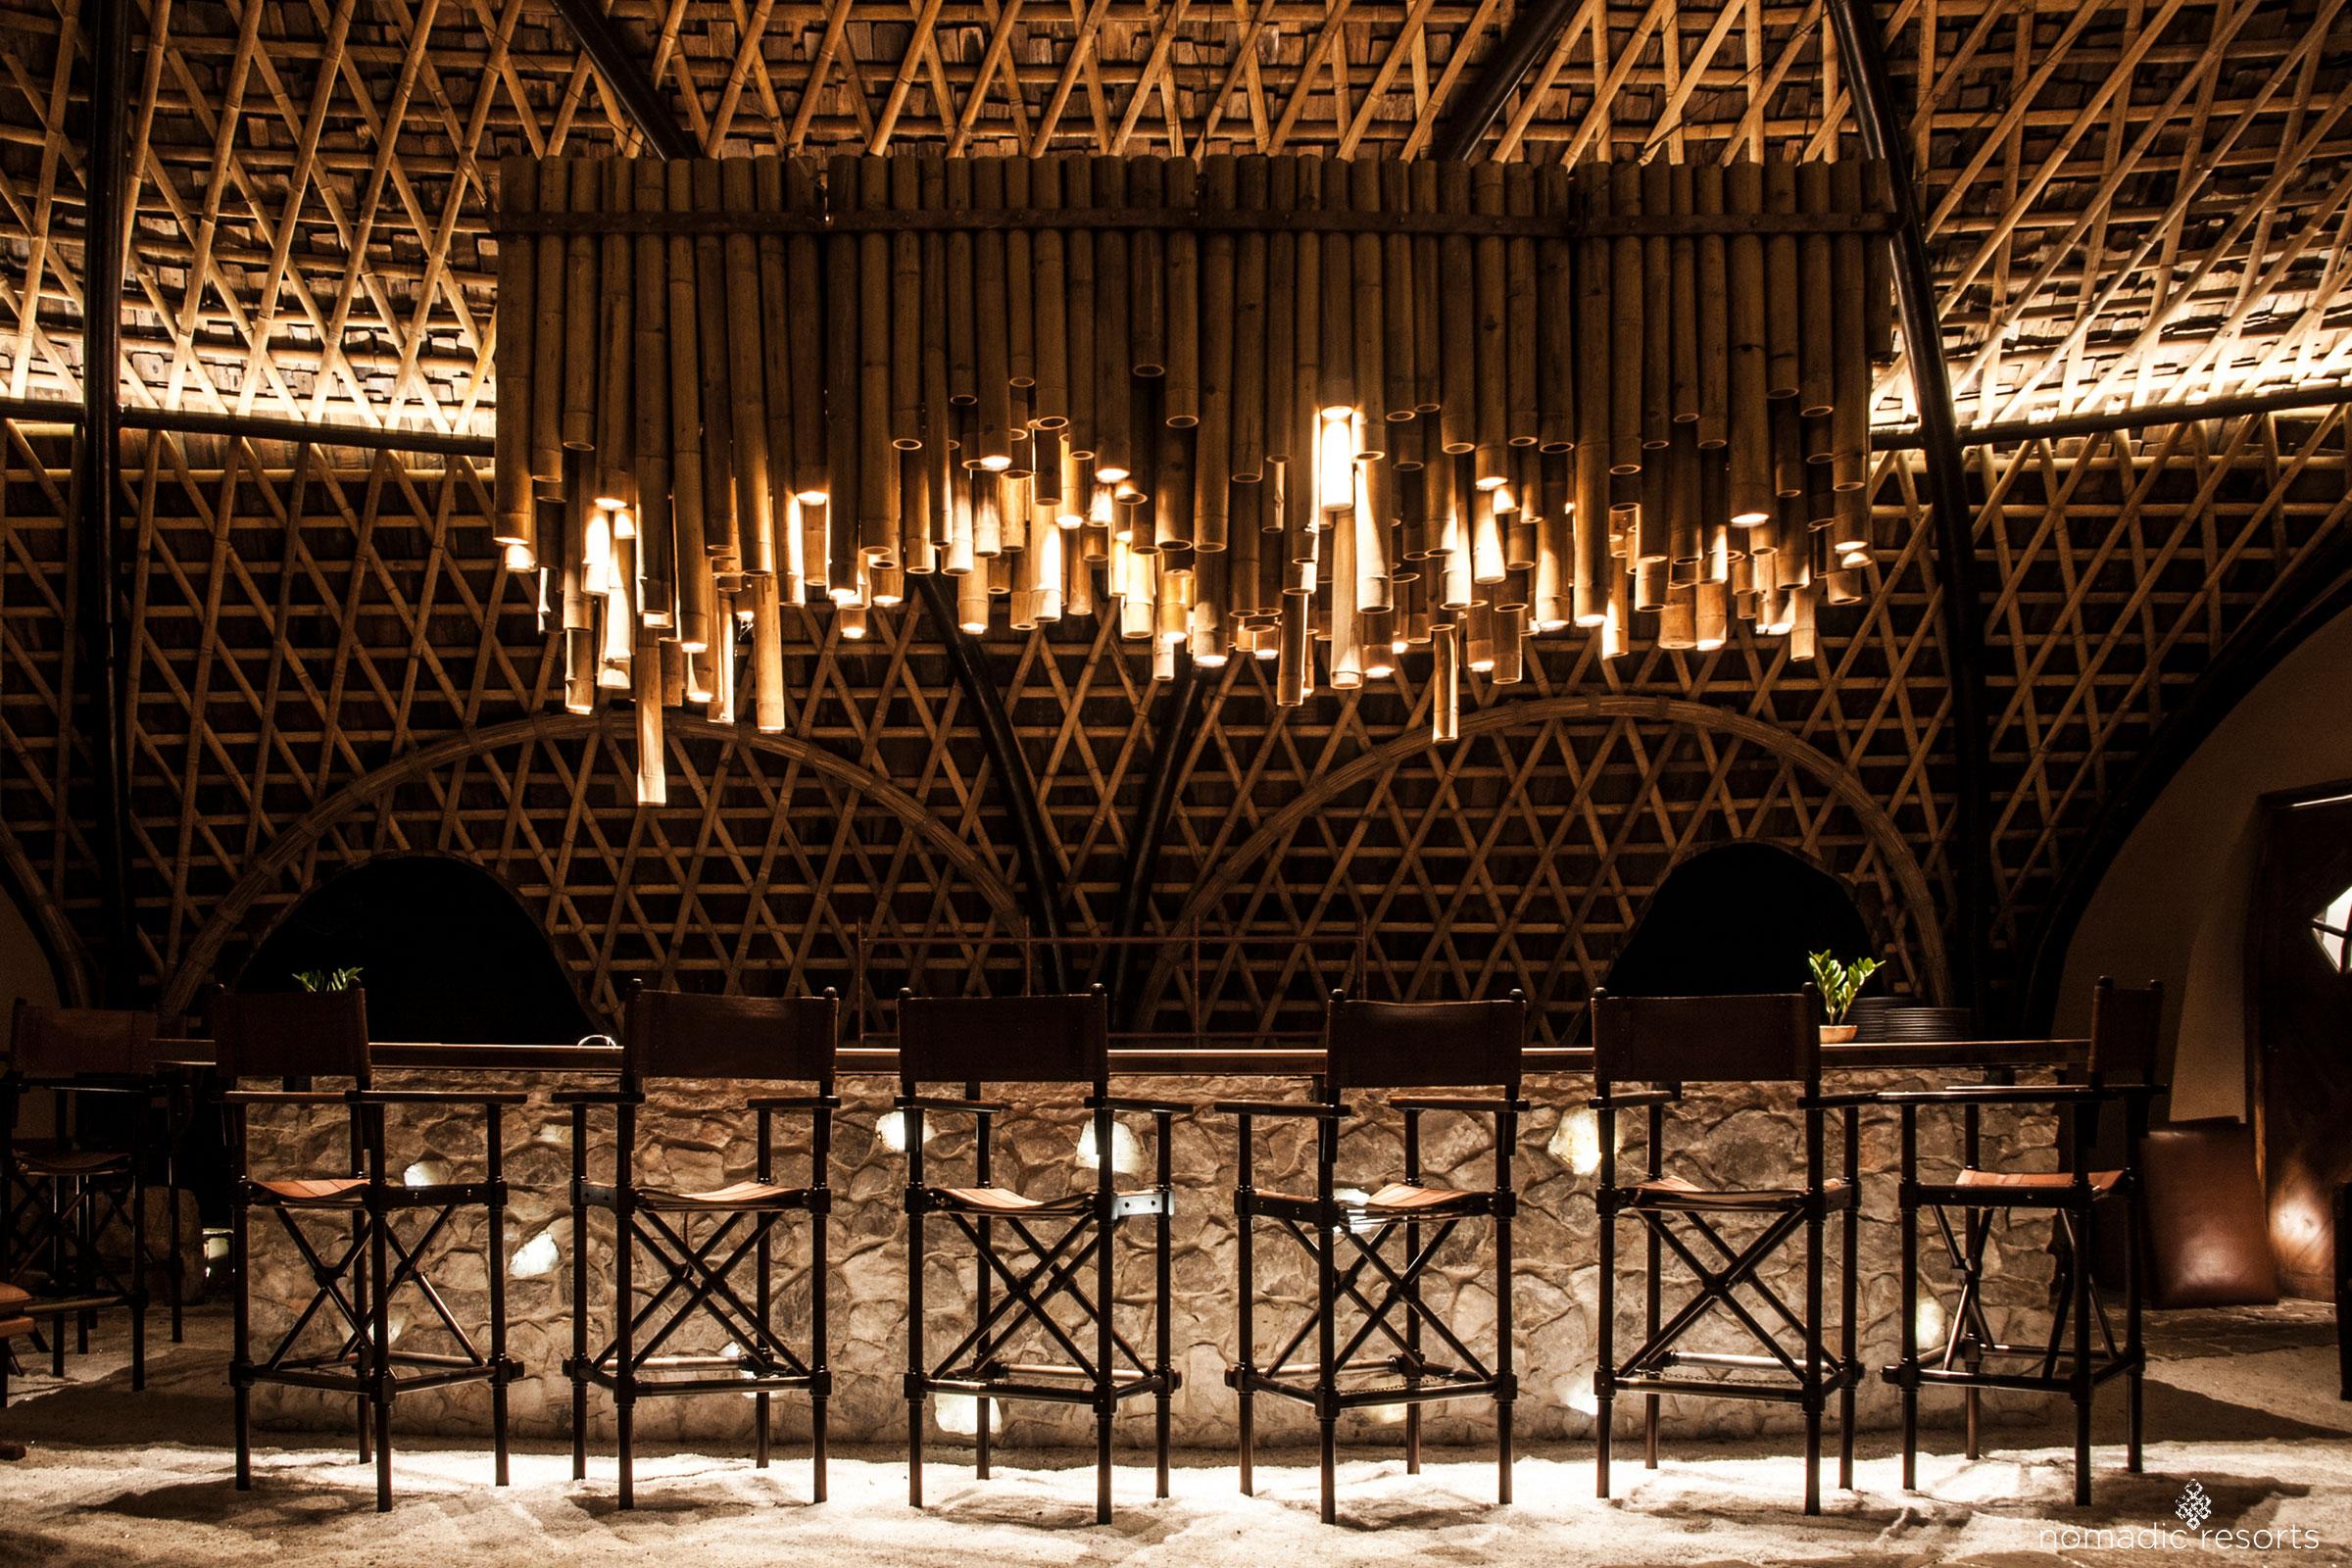 bar interior of wild coast tented lodge, yala national park, sri lanka